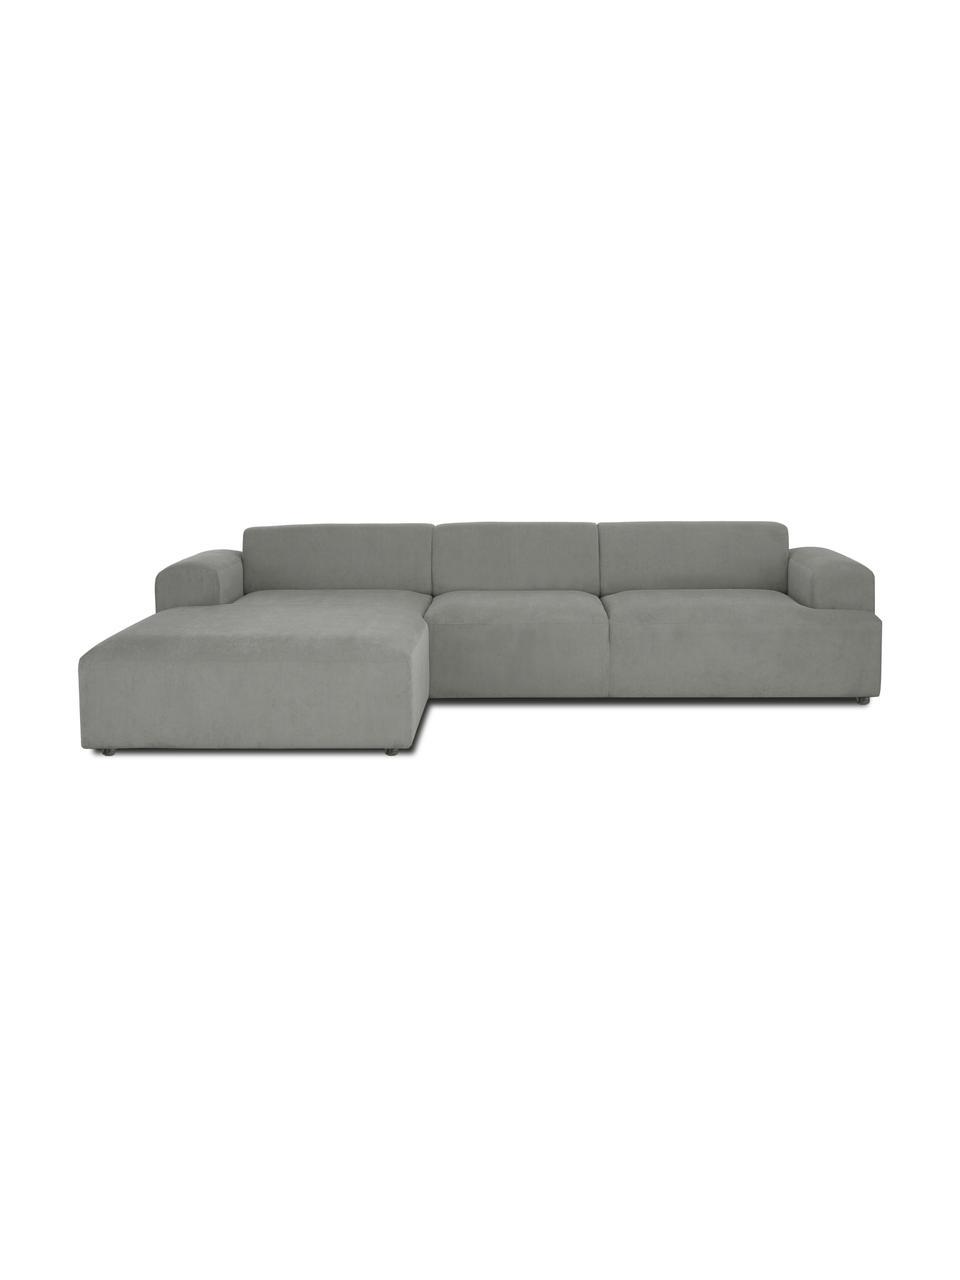 Cord-Ecksofa Melva (4-Sitzer) in Grau, Bezug: Cord (92% Polyester, 8% P, Gestell: Massives Kiefernholz, FSC, Füße: Kunststoff, Cord Grau, B 319 x T 196 cm